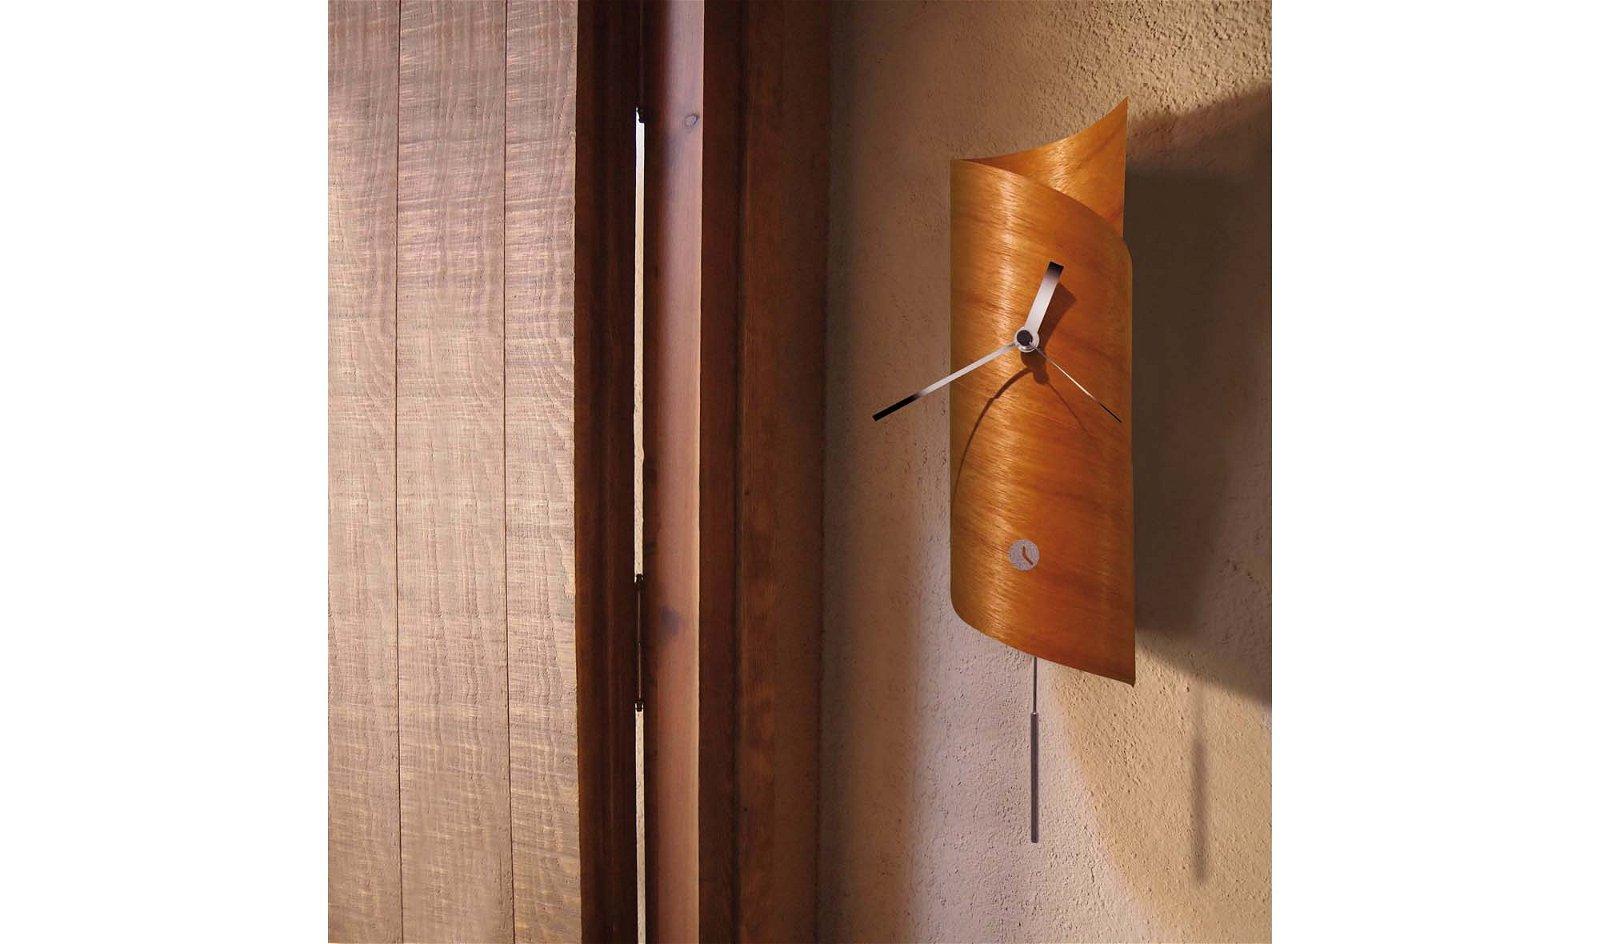 Reloj de Pared Wallsurf by Tothora